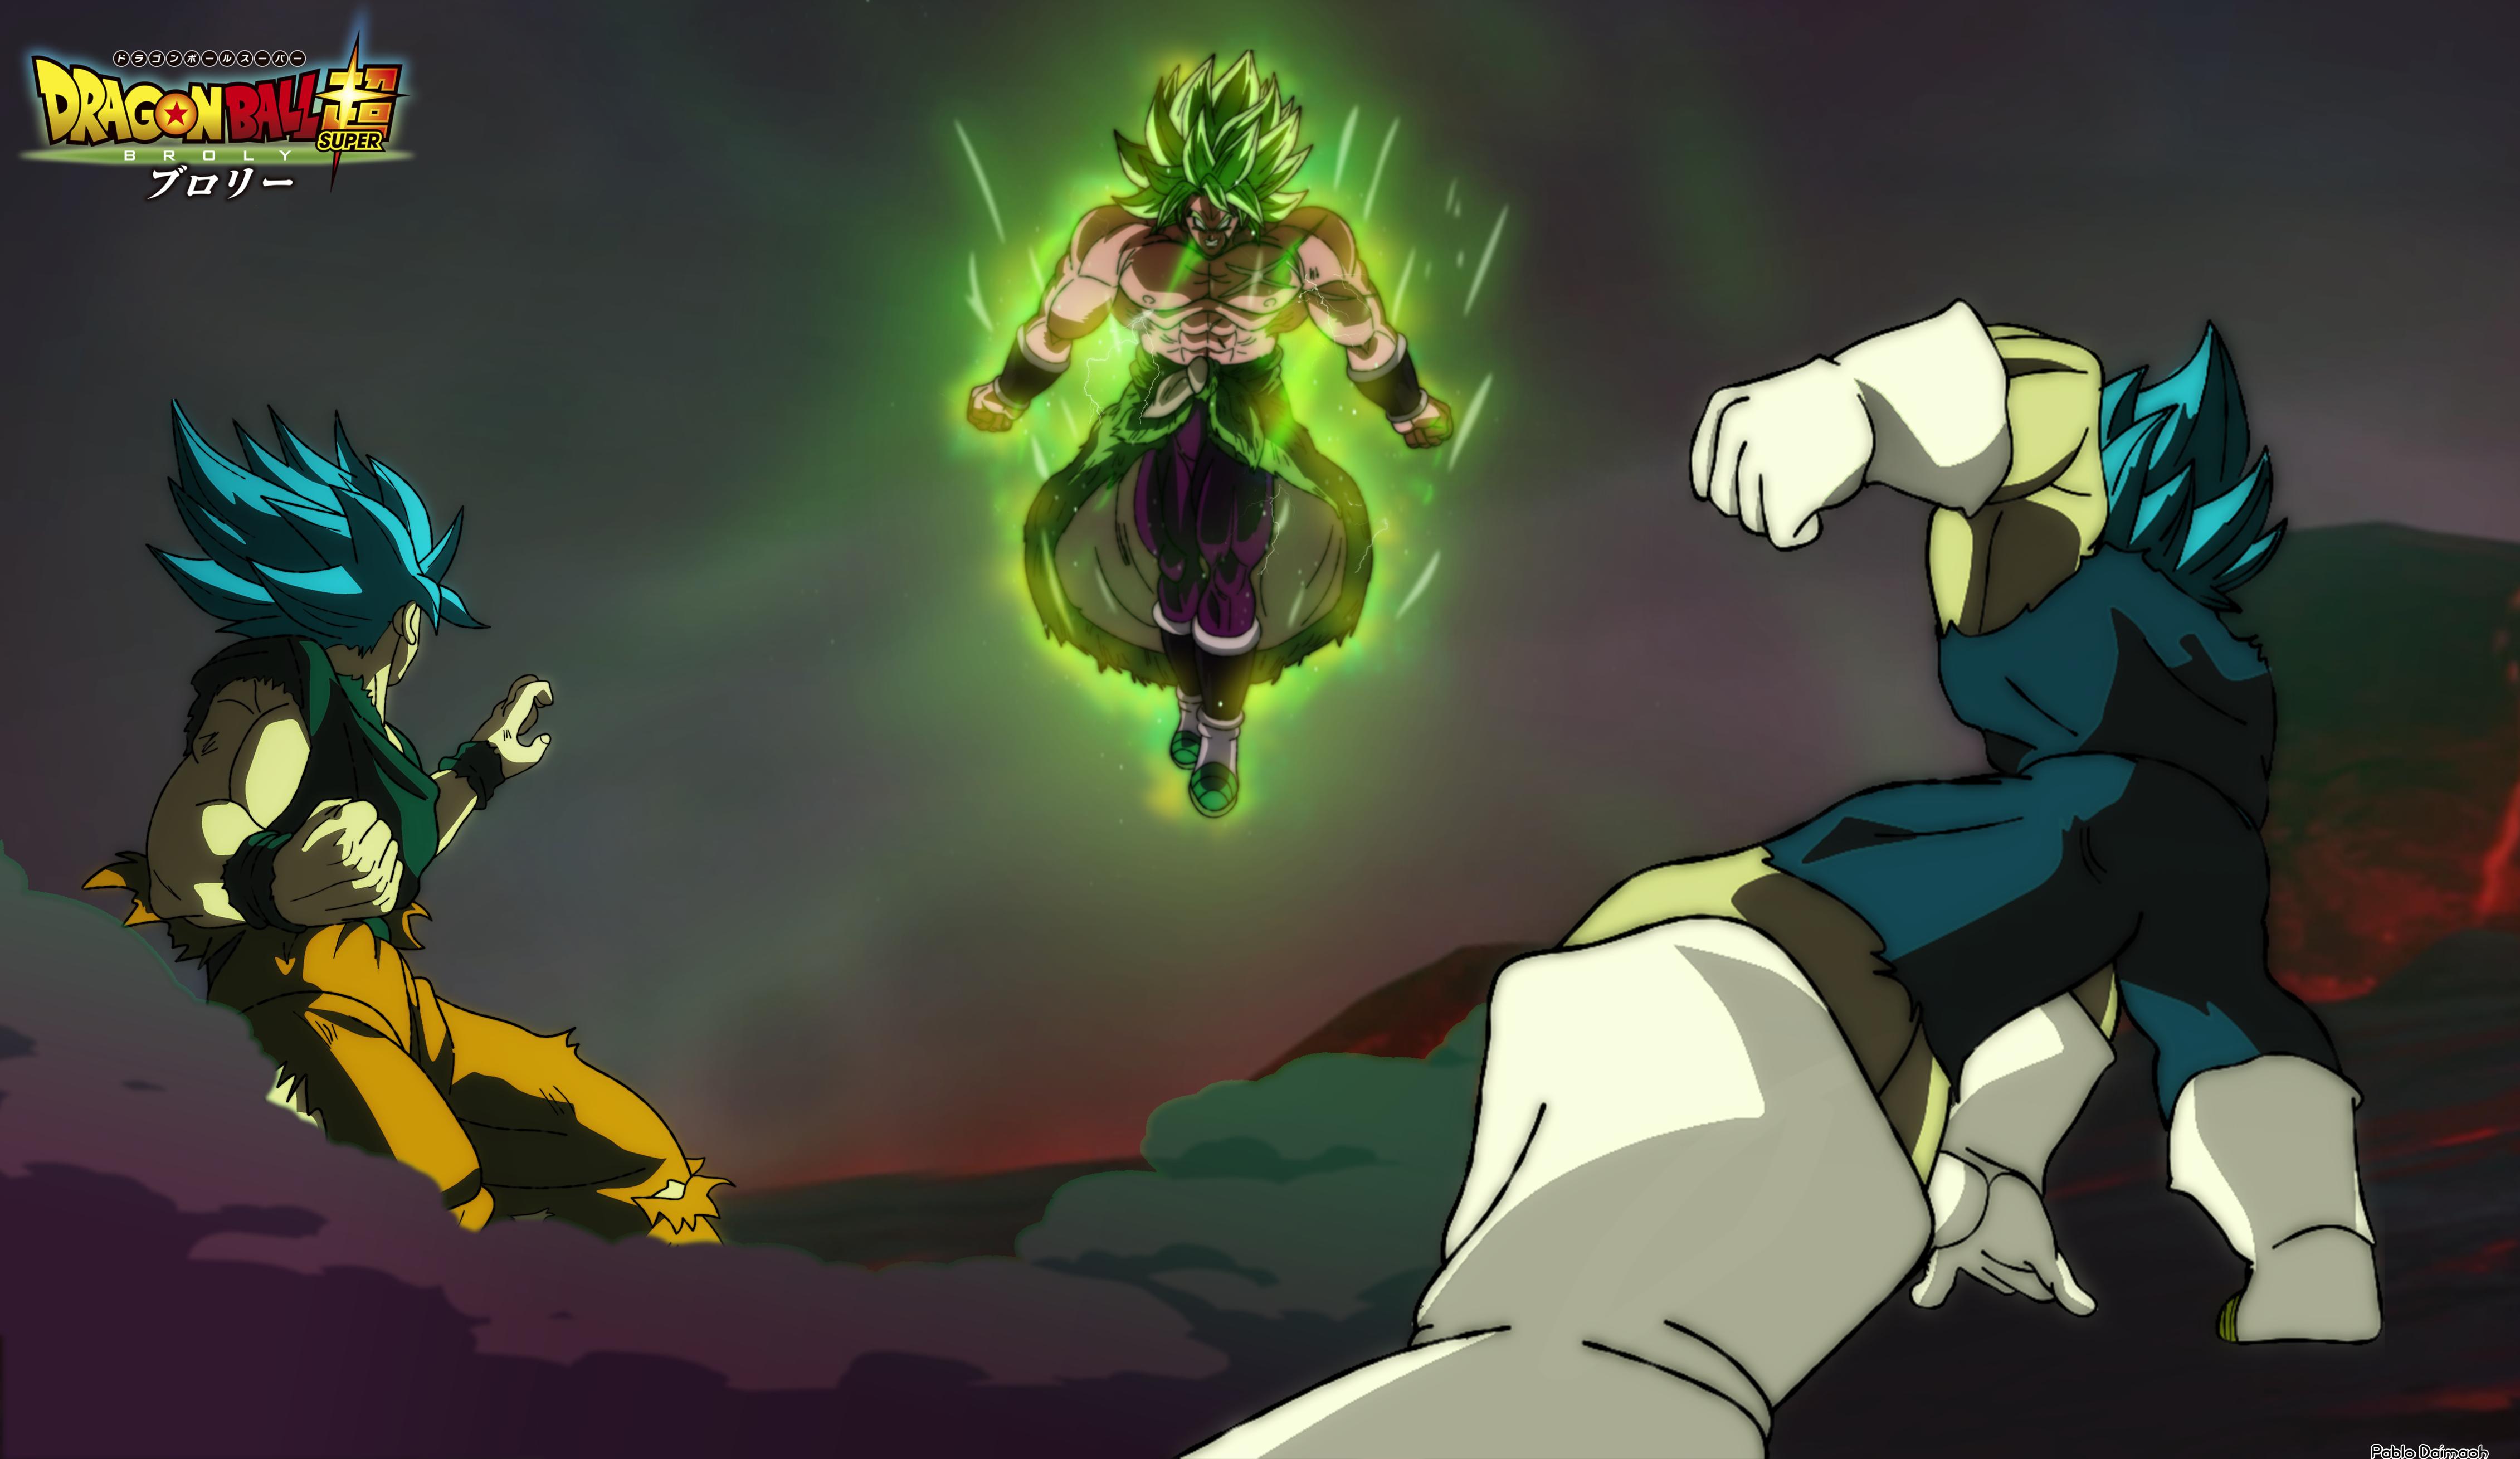 Goku And Vegeta Vs Broly 4523x2618 Download Hd Wallpaper Wallpapertip